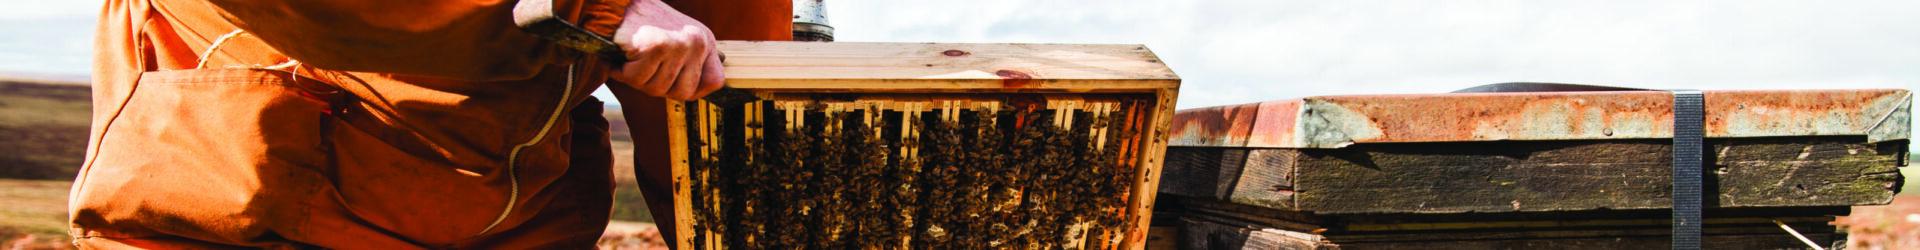 beekeeping demo